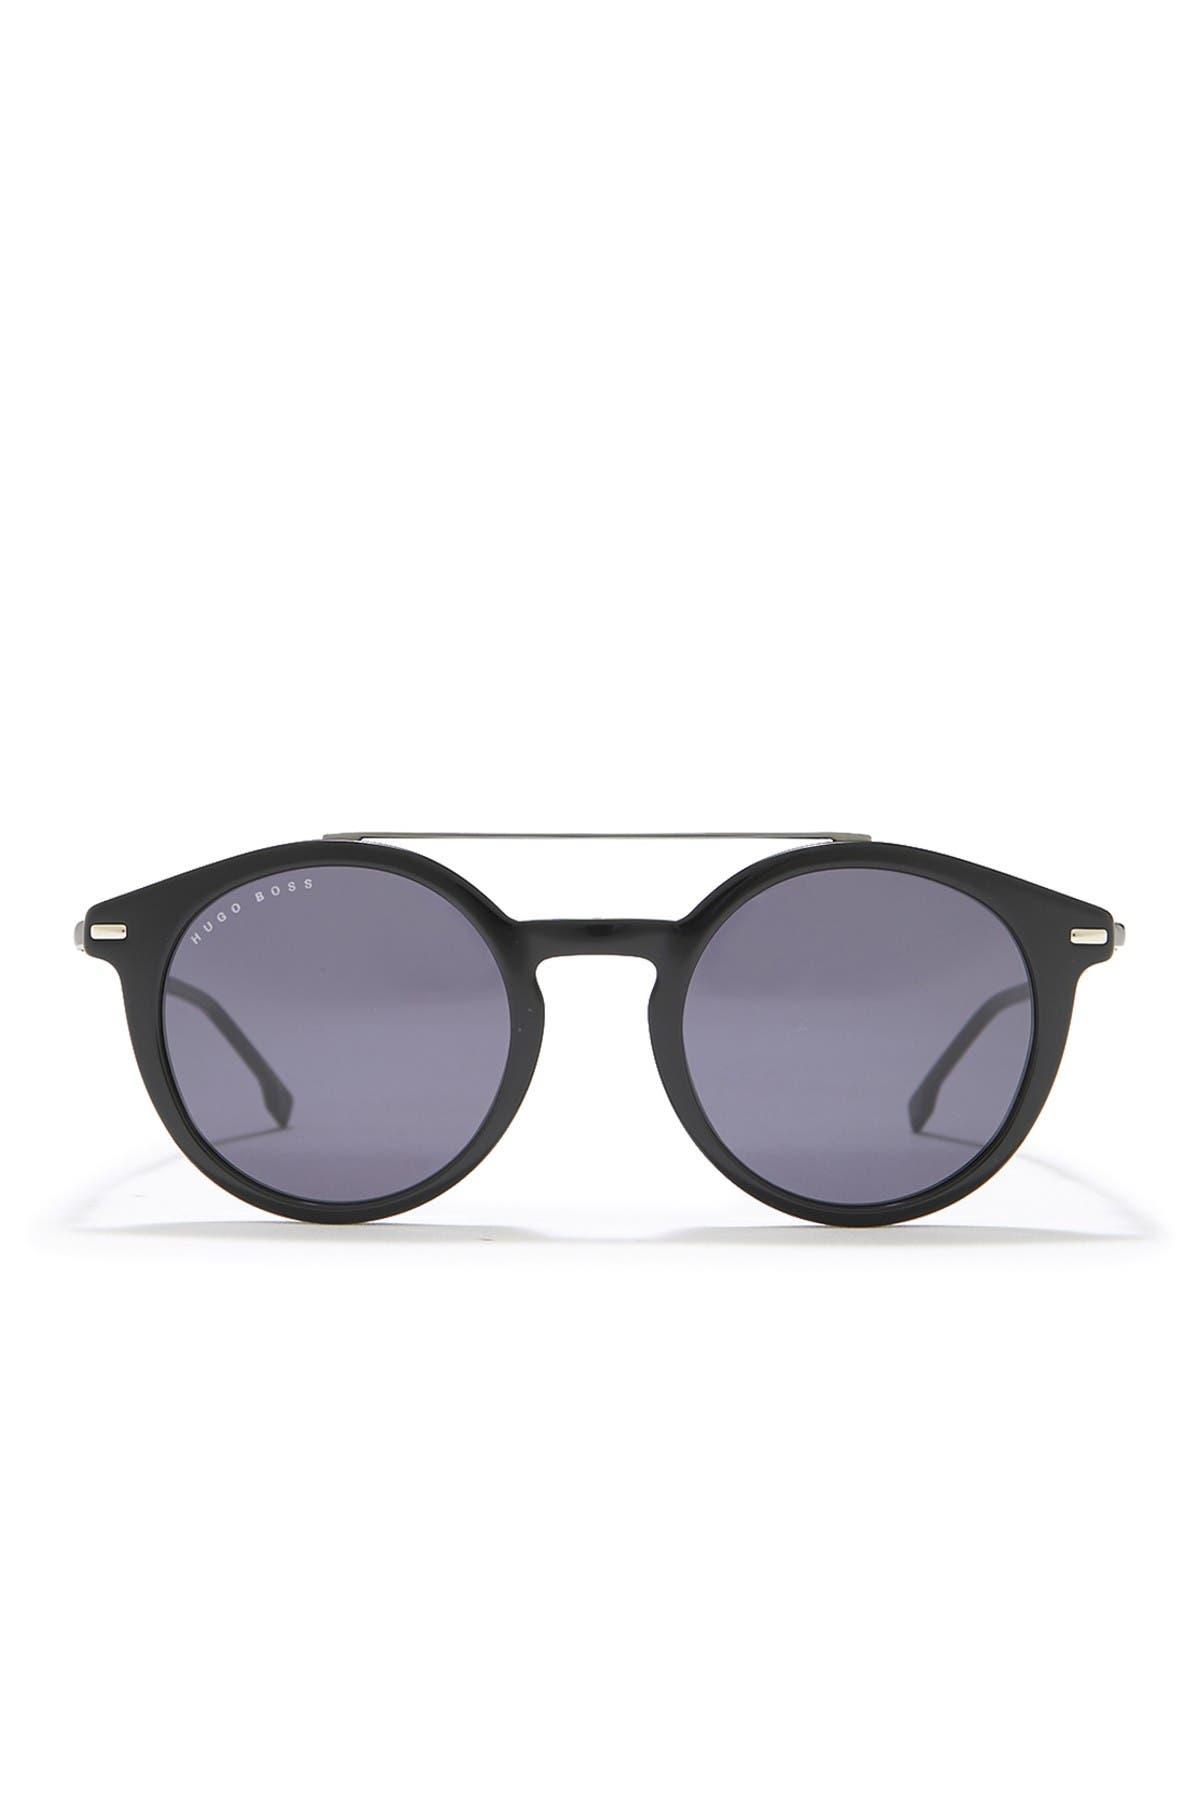 Image of BOSS 49mm Round Sunglasses